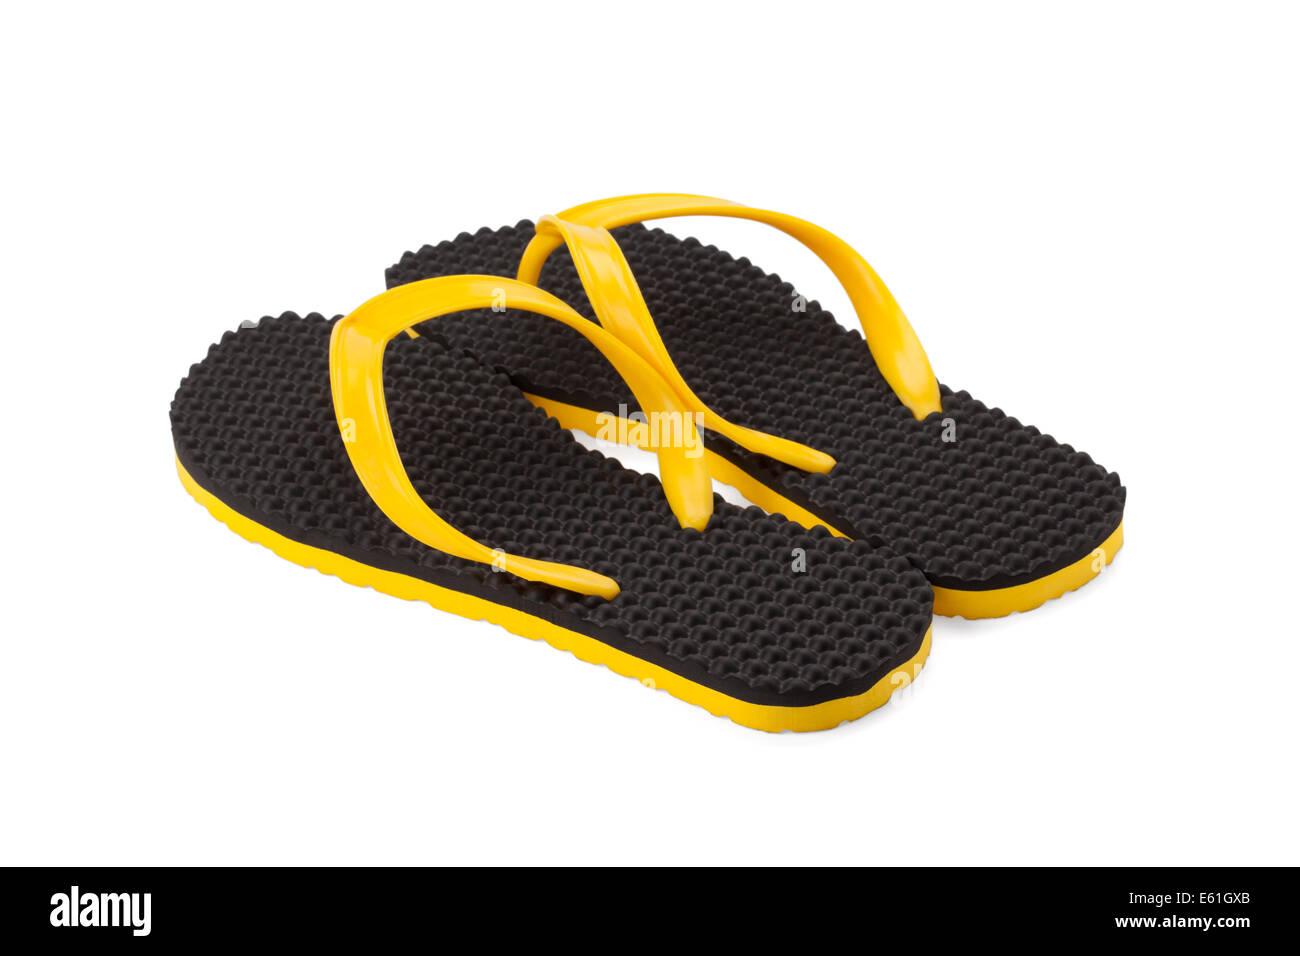 flipflop or sandal shoe isolated on white background - Stock Image